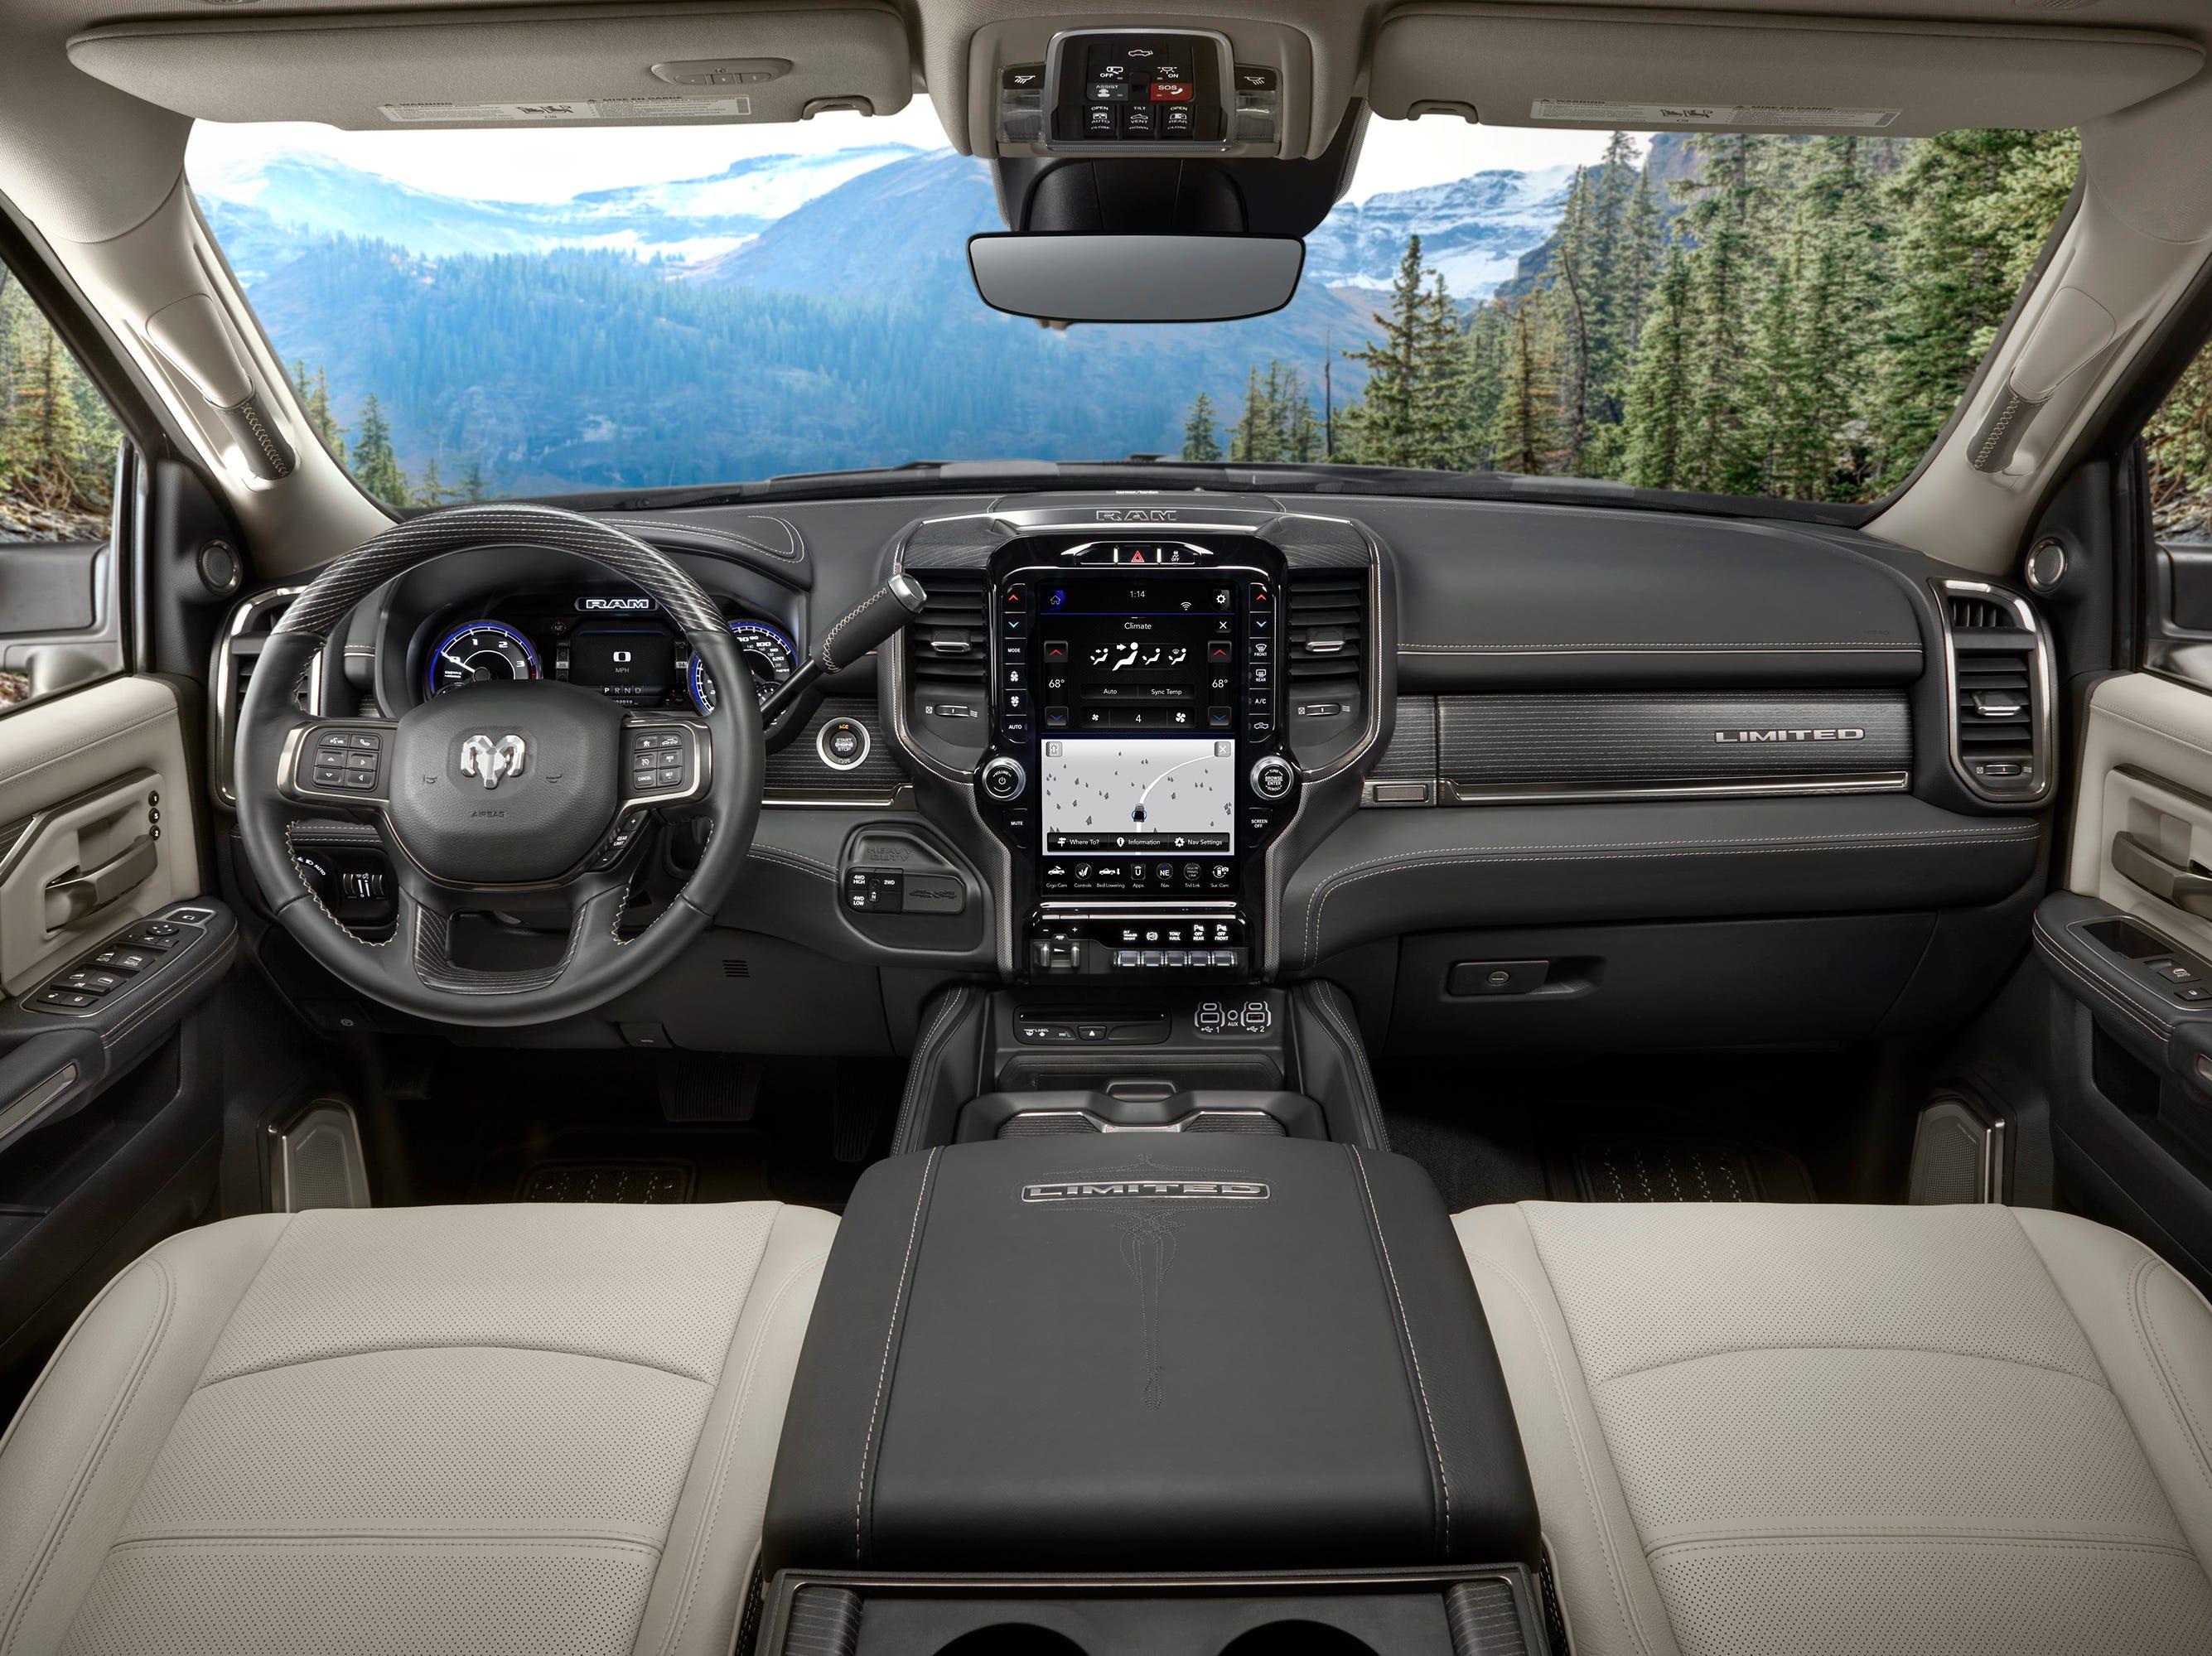 2019 Ram Heavy Duty Limited interior